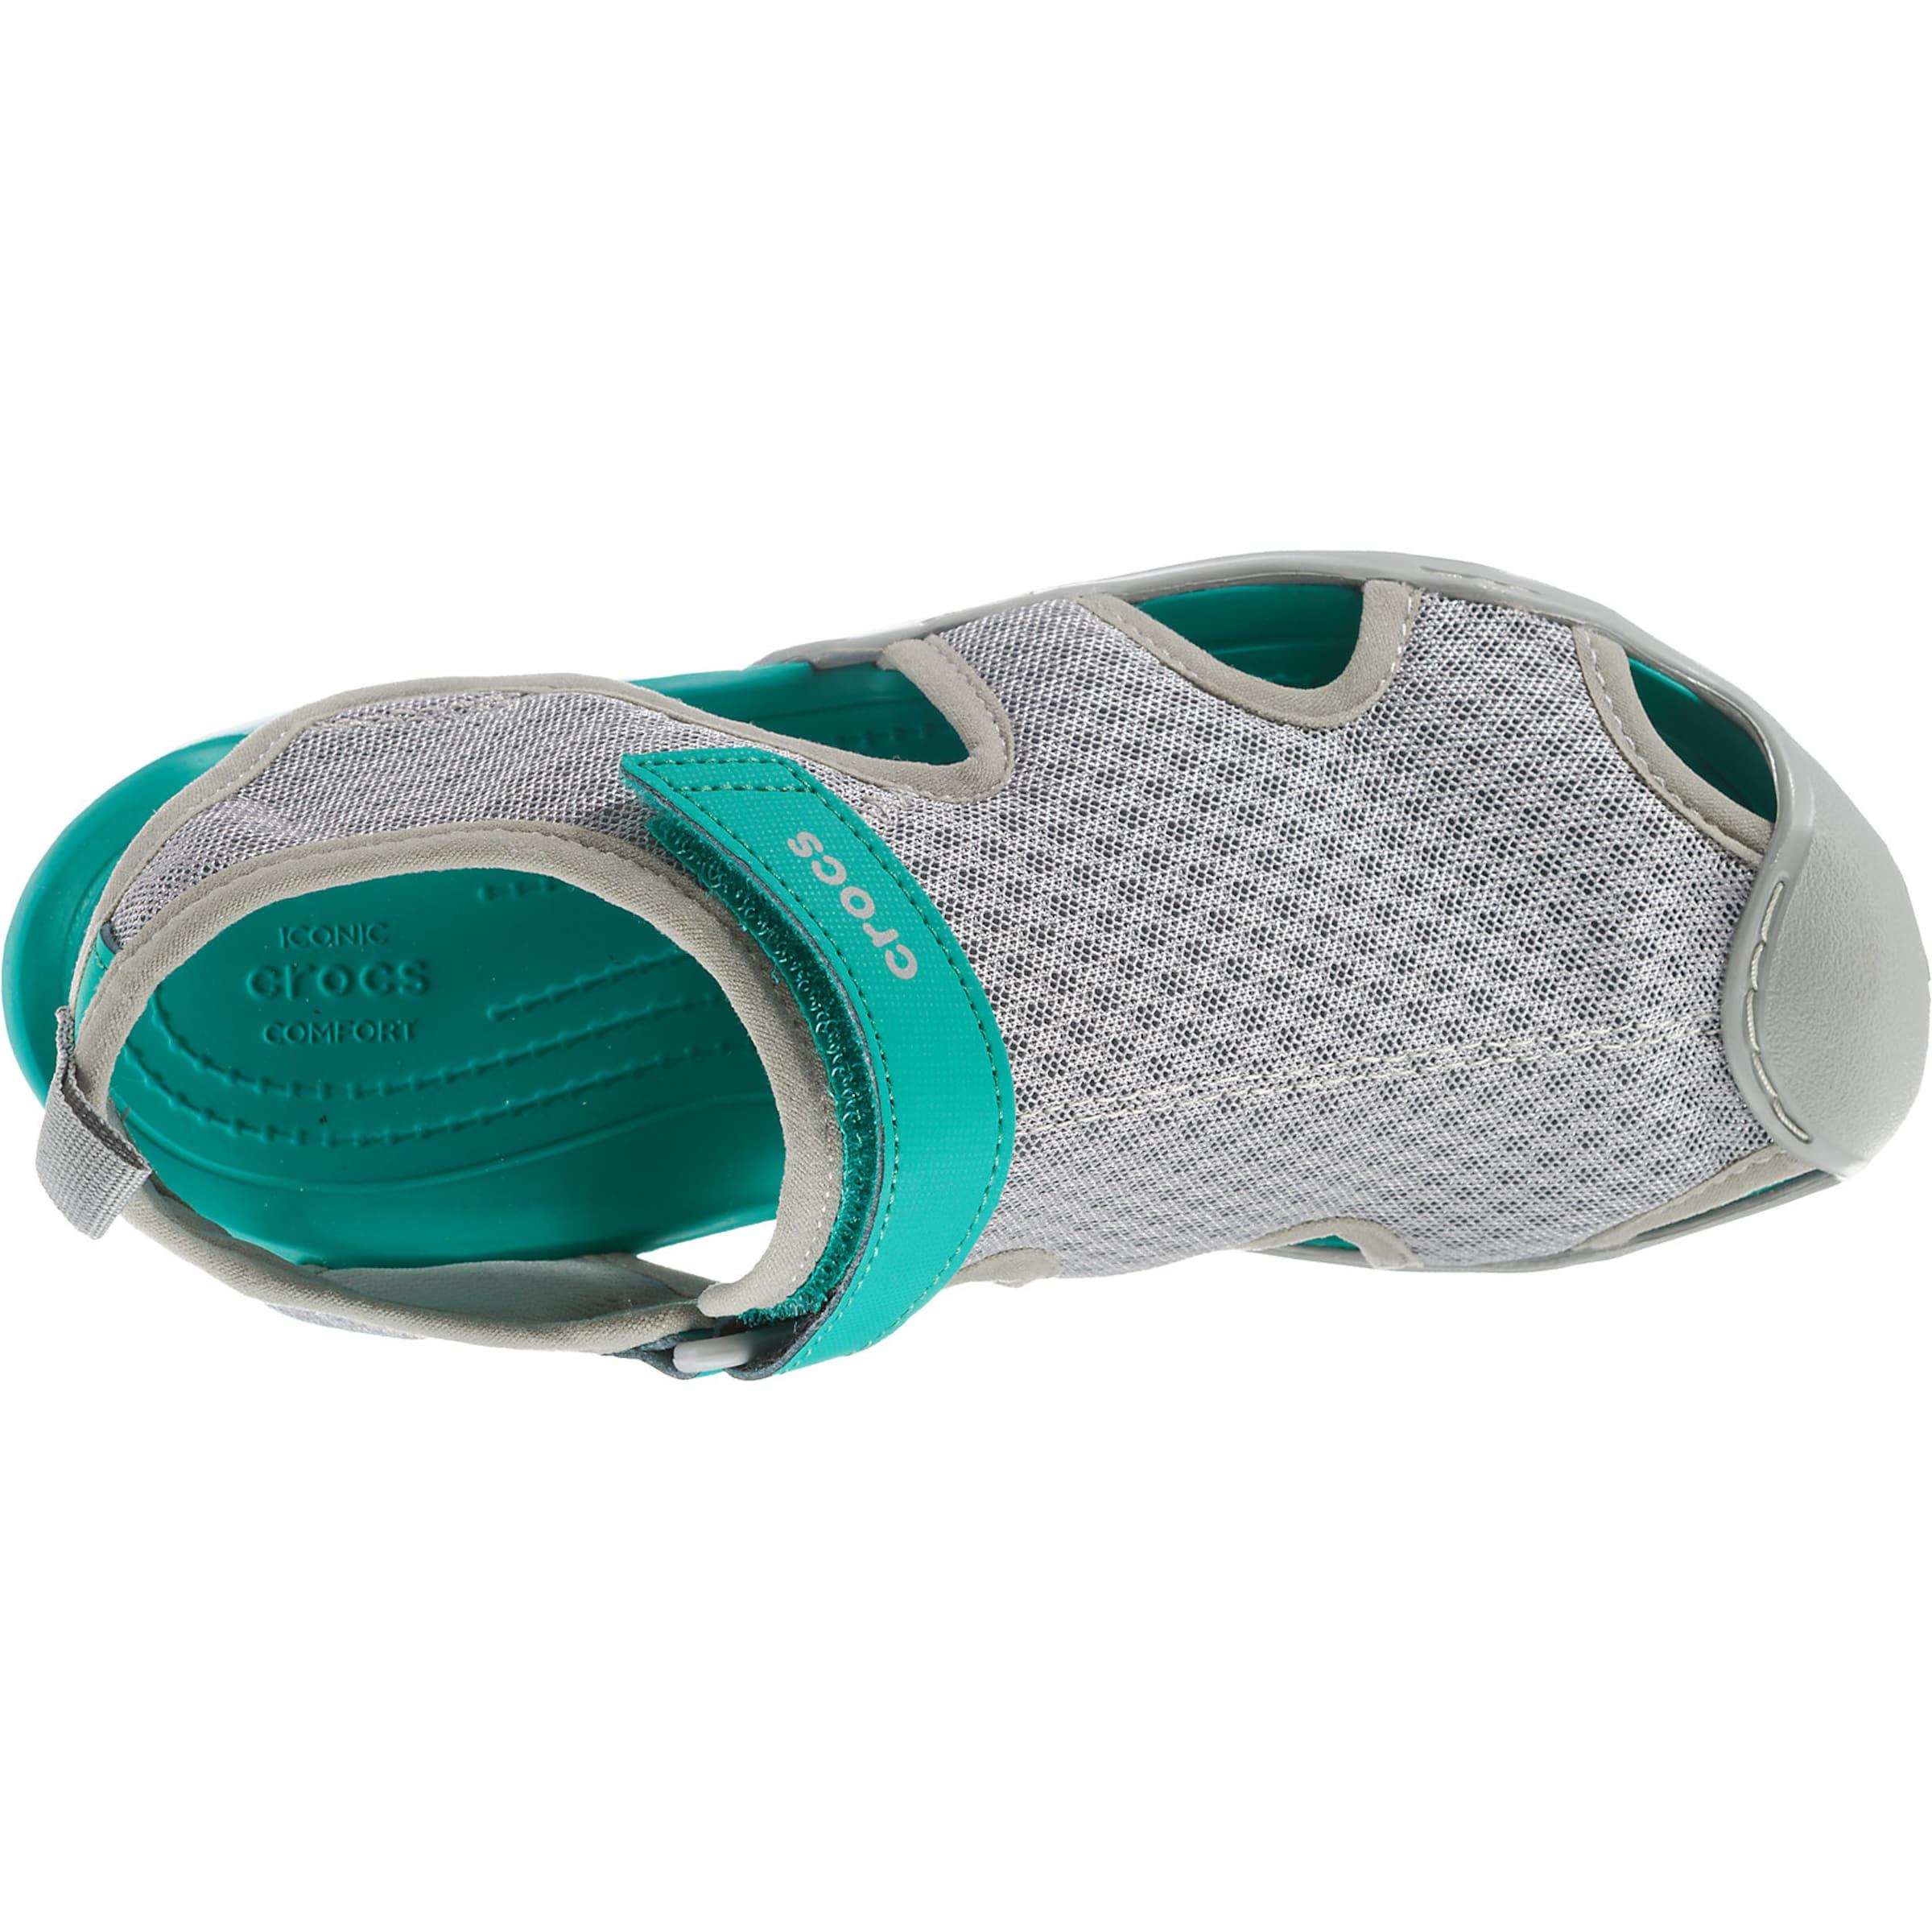 Crocs Sandale Sandale Sandale 'Swiftwater Textil Billige Herren- und Damenschuhe 39a4ac